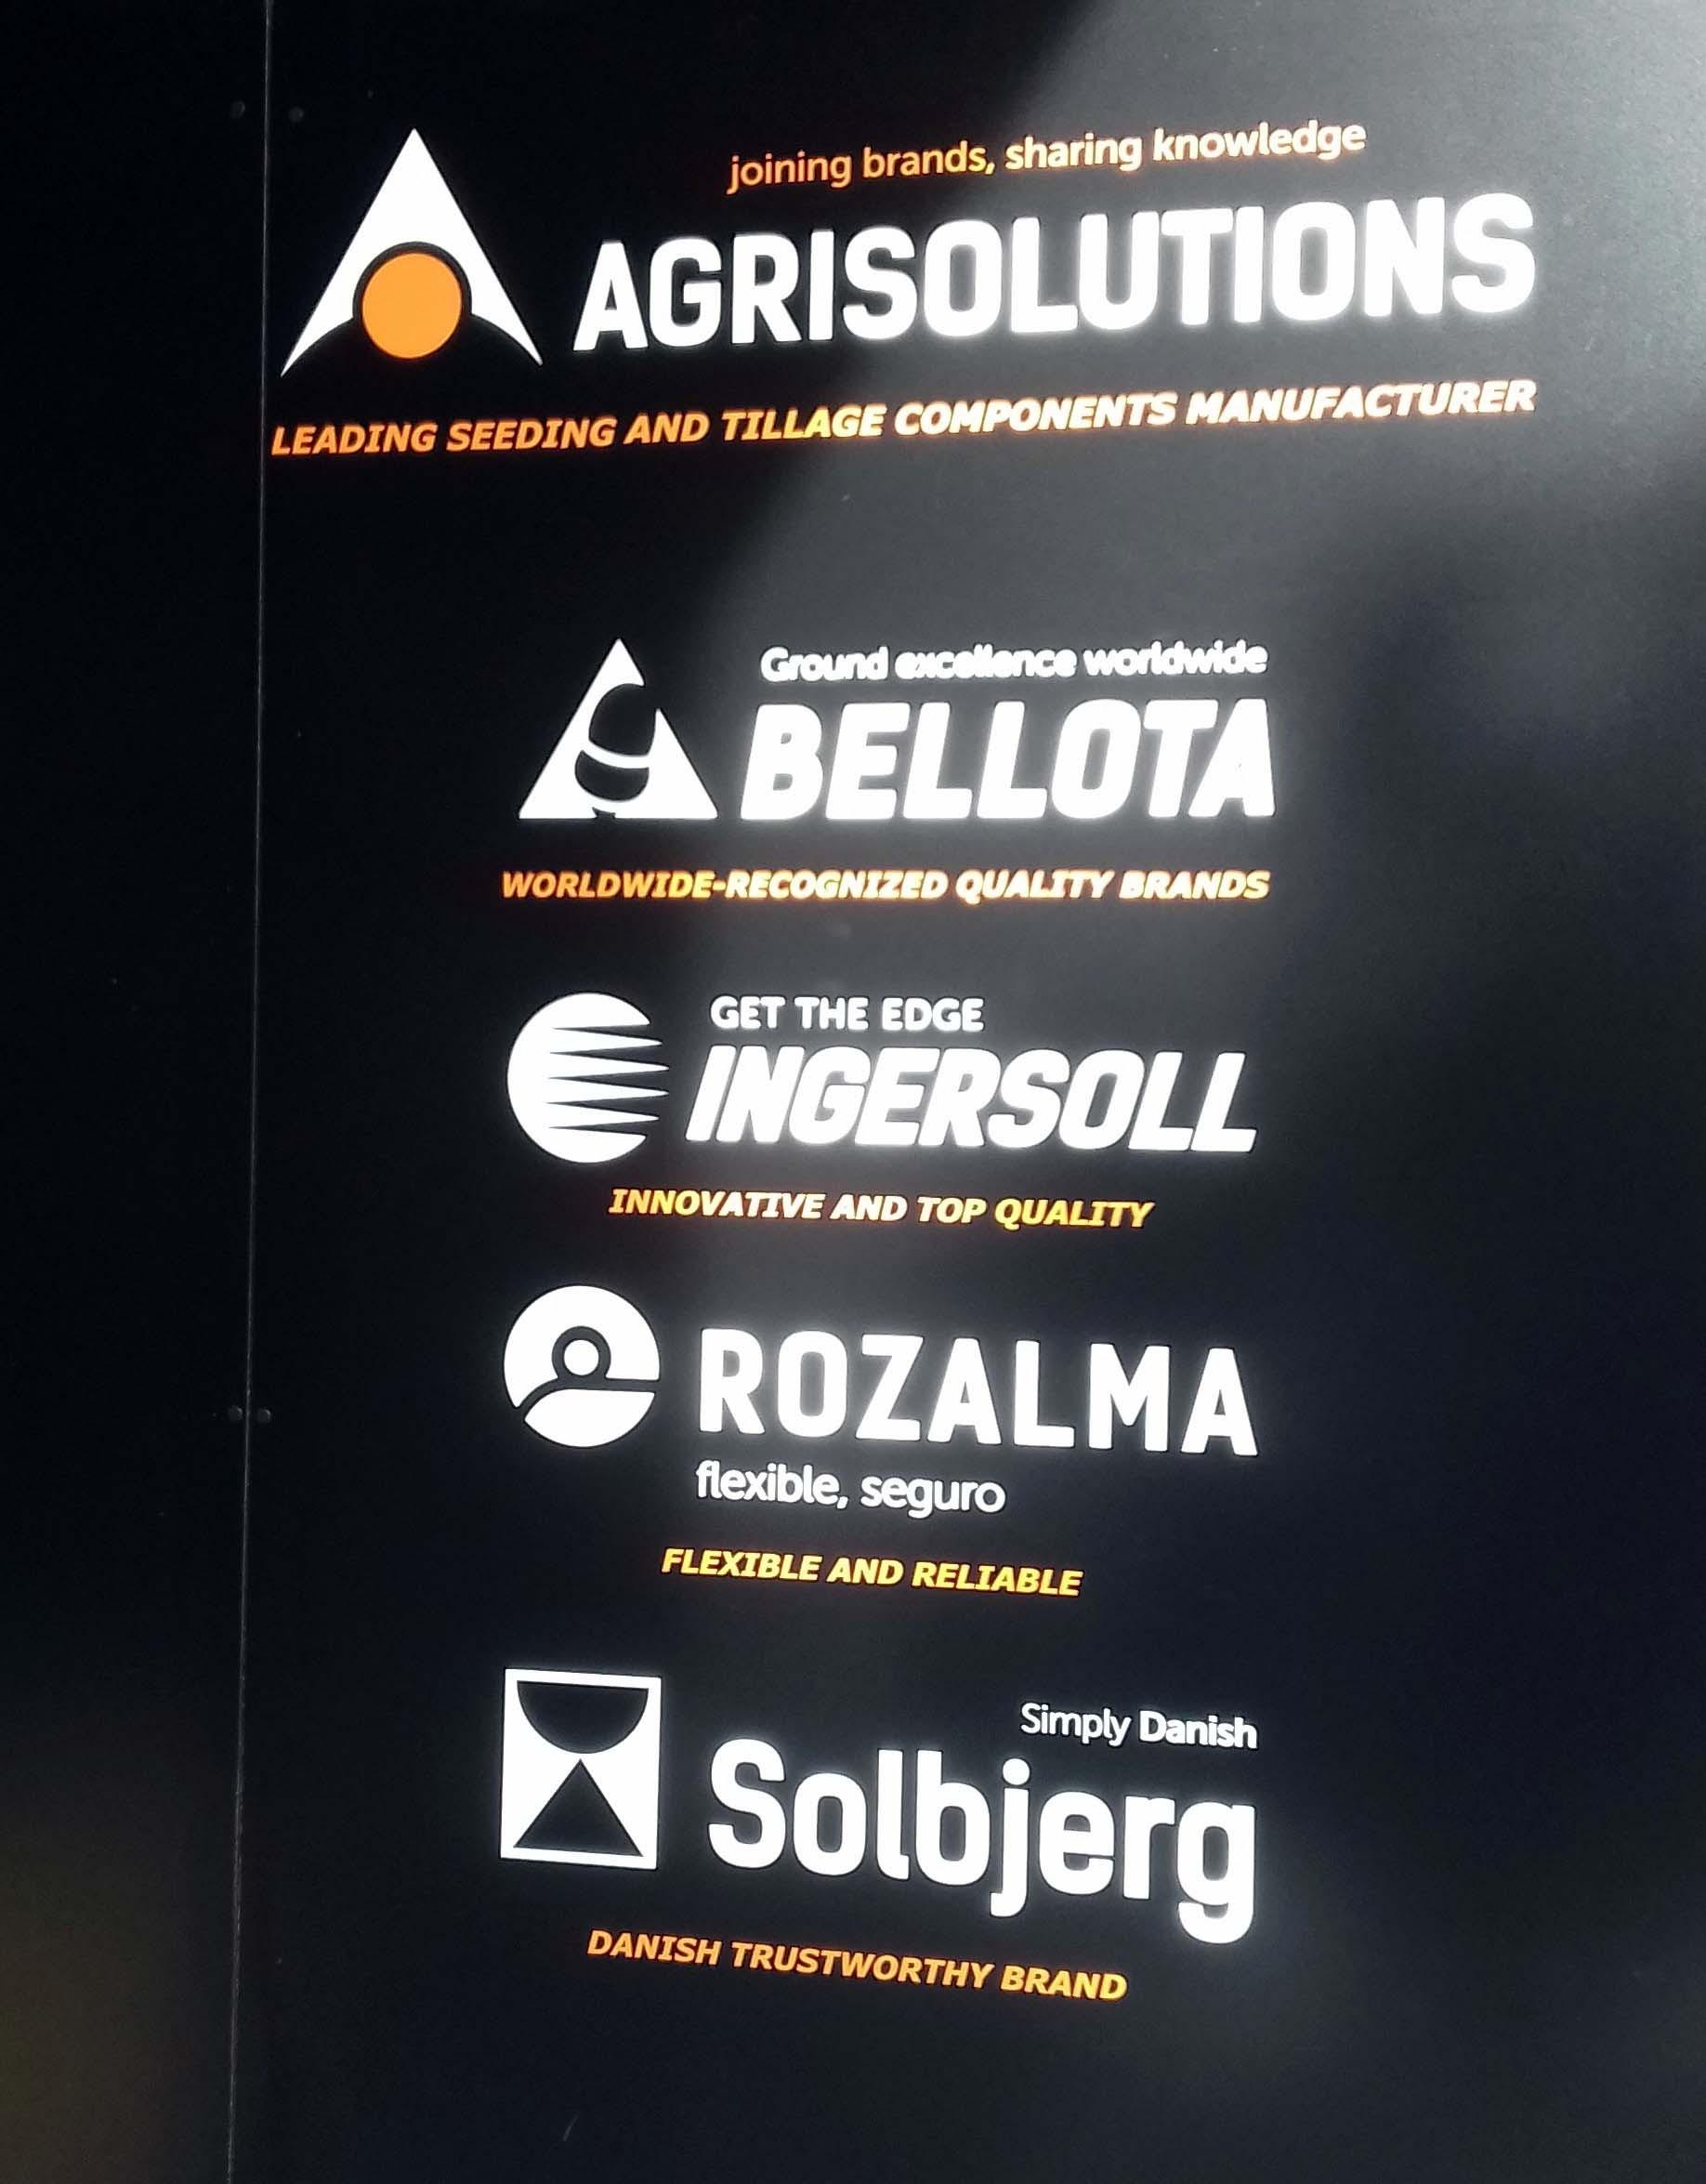 BellotaAgrisolutions-SIMA201706